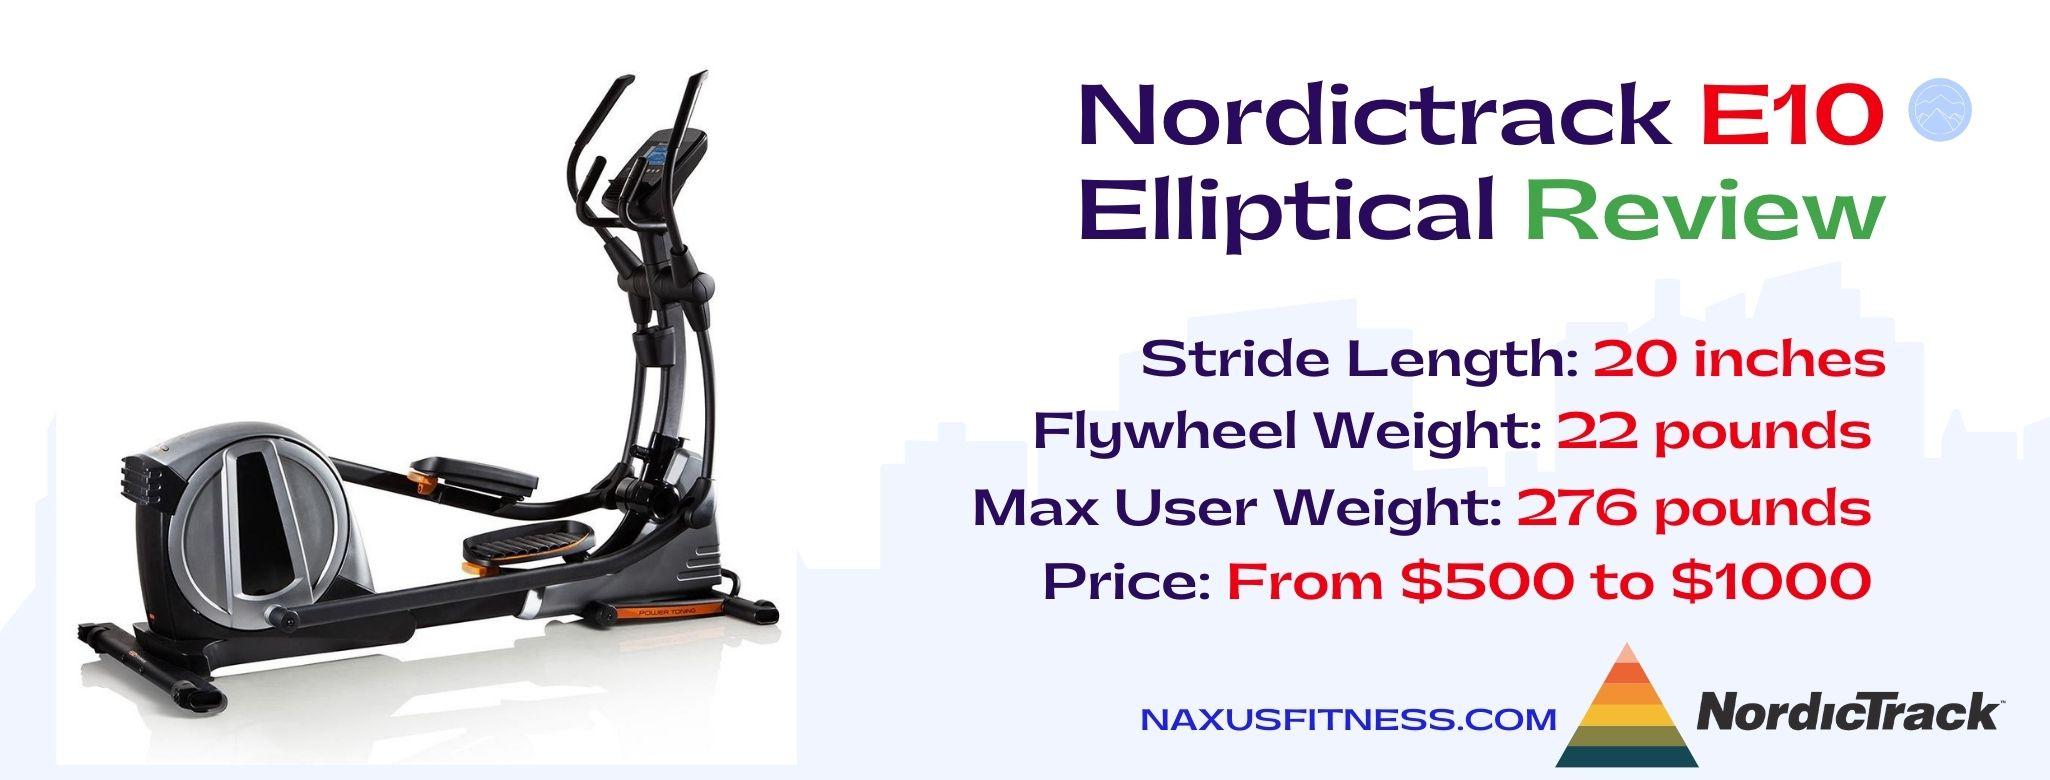 Nordictrack E10 Elliptical Machine Features